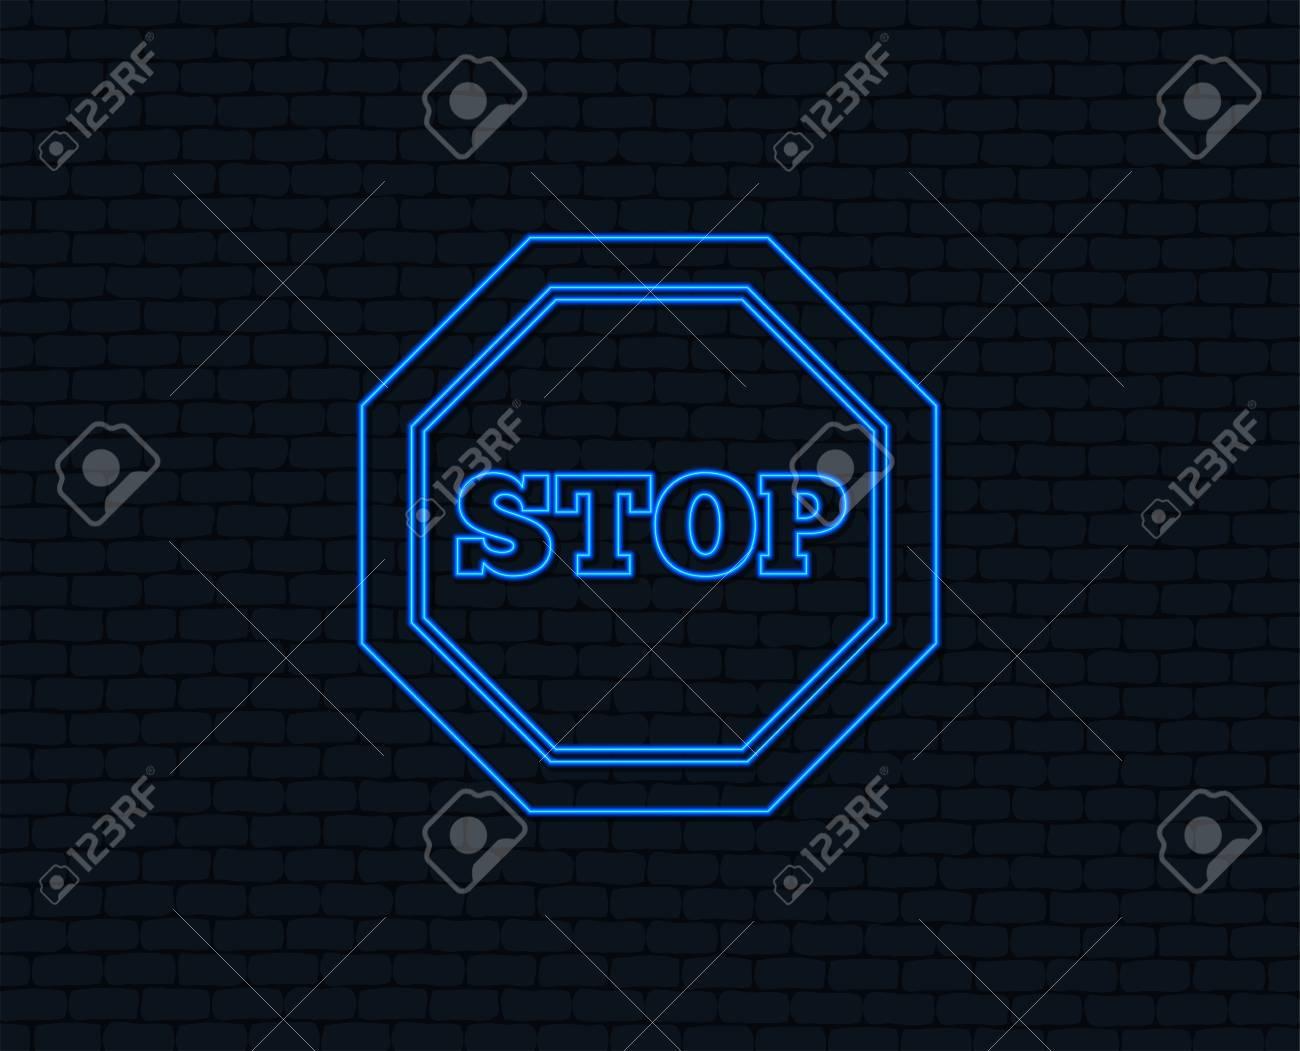 hight resolution of neon light traffic stop sign icon caution symbol glowing graphic design brick